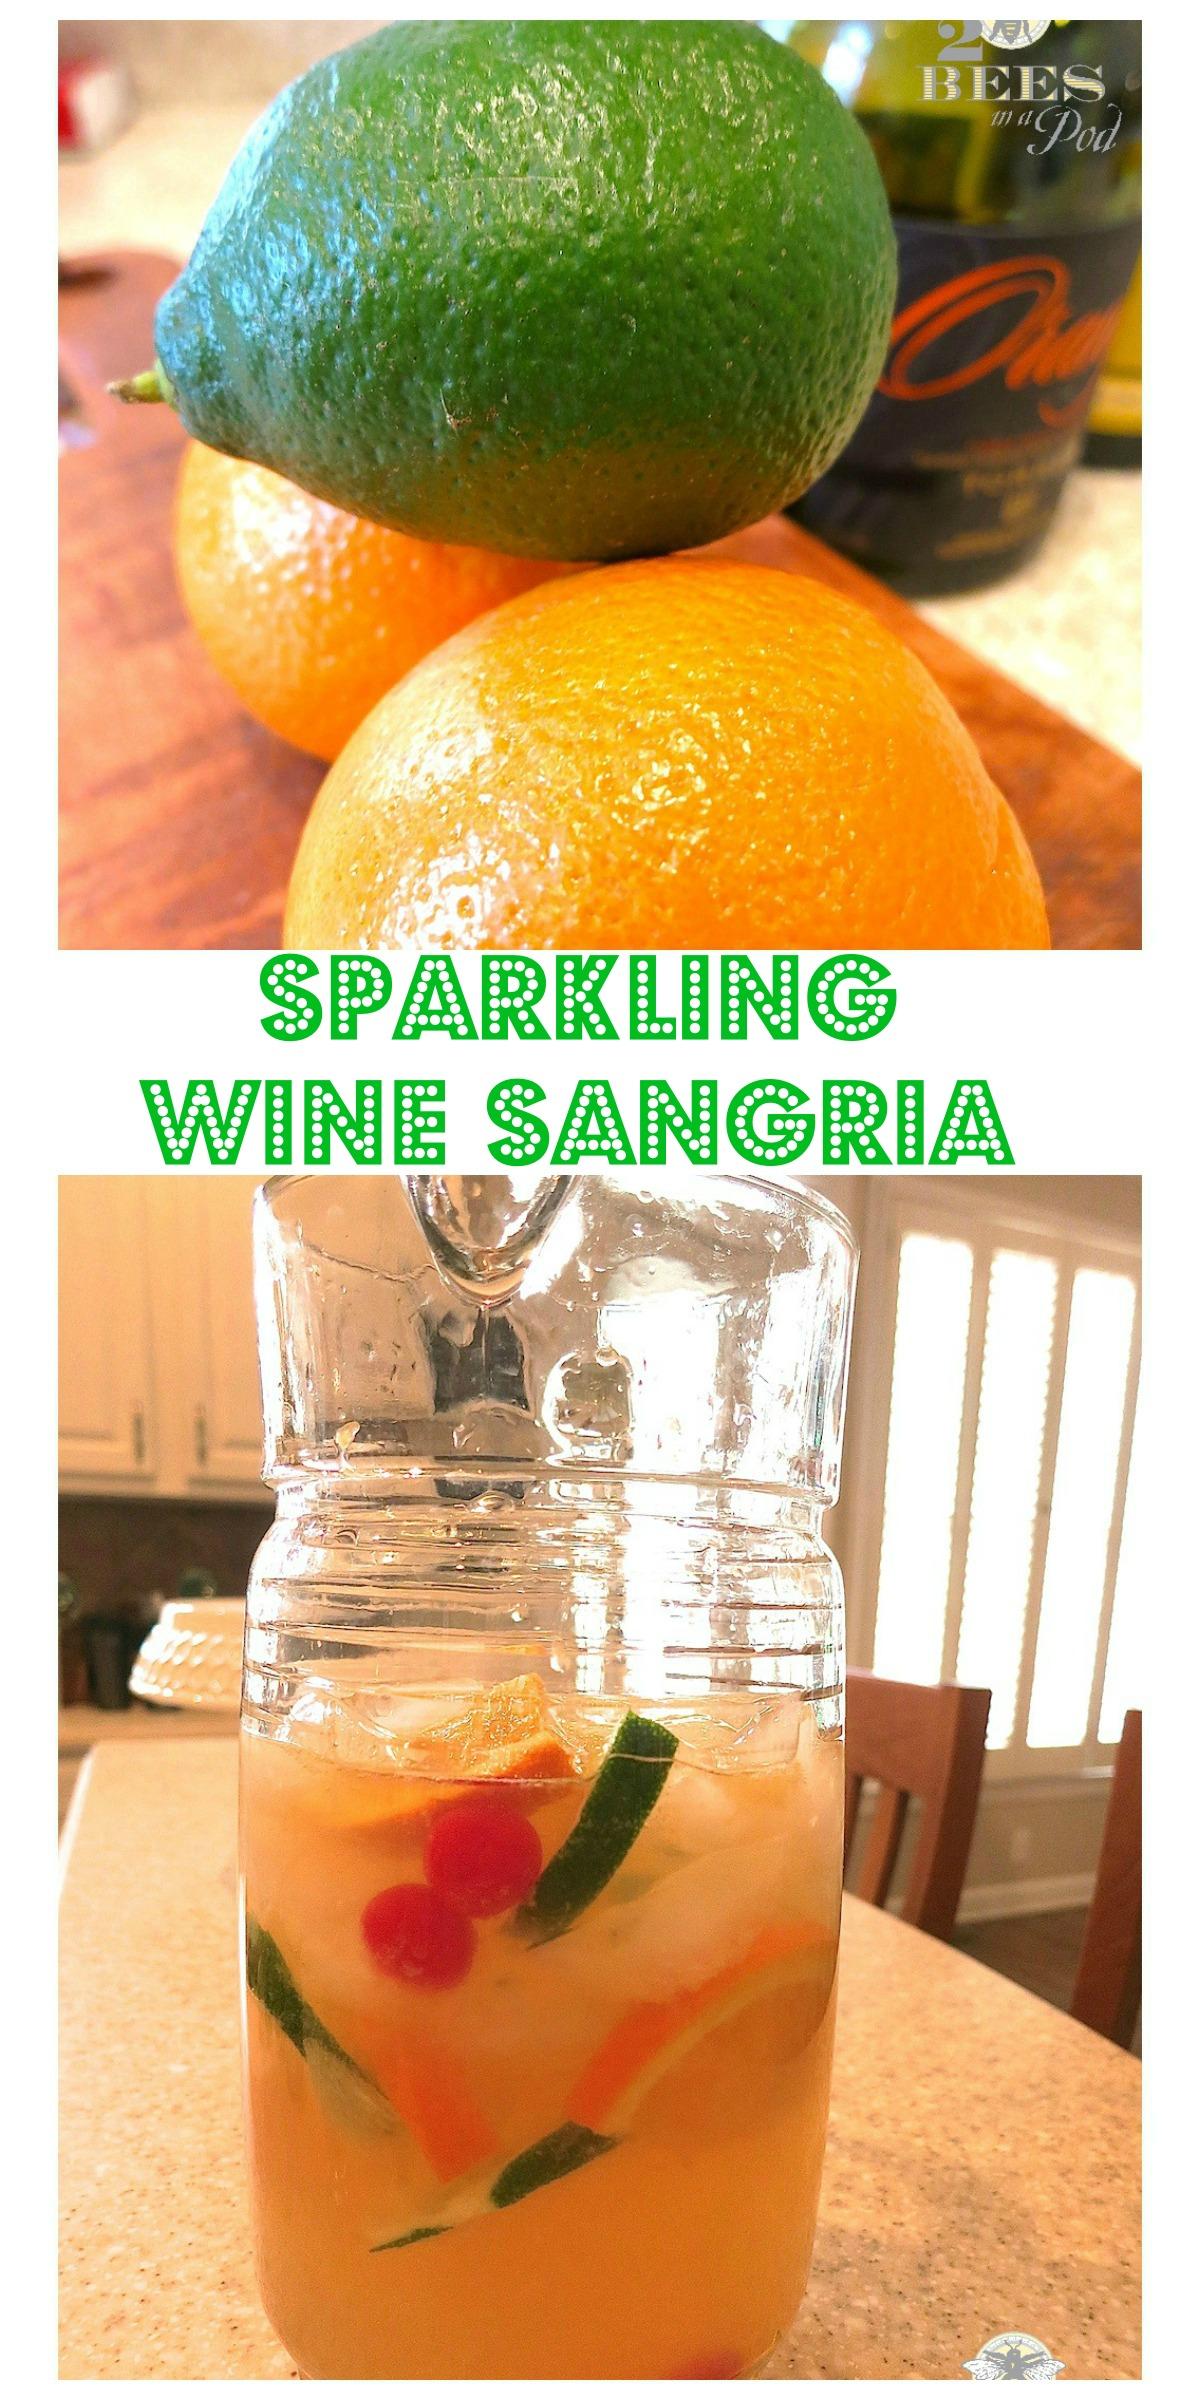 Sparkling Wine Sangria